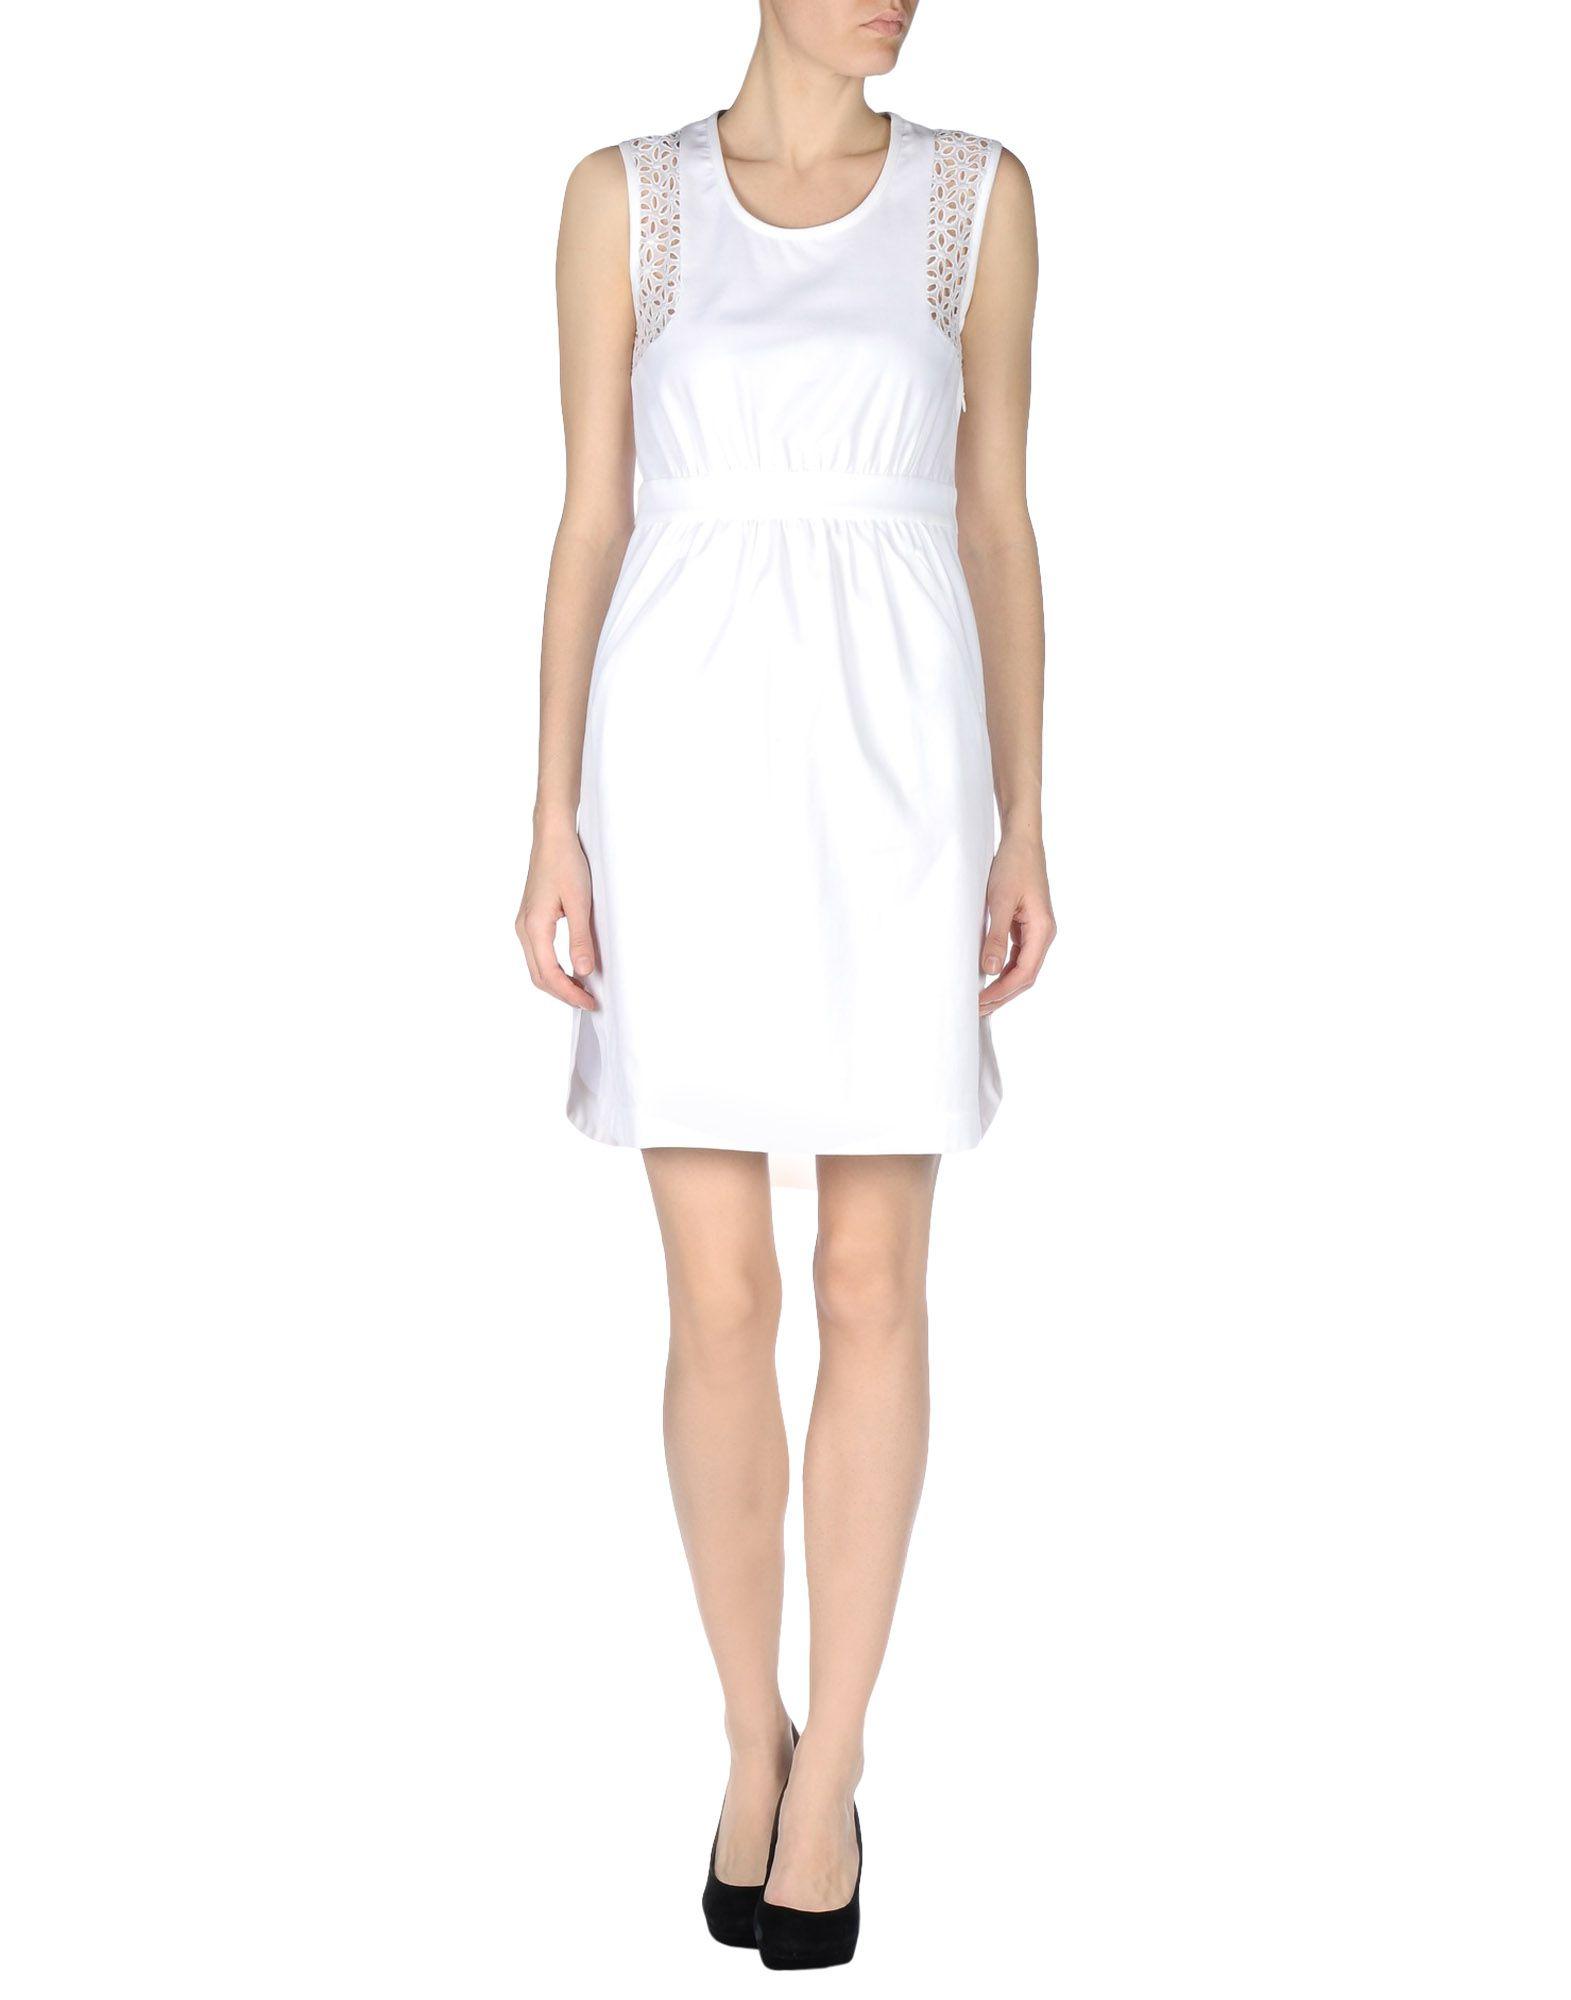 Short sleeved floral dress Caractere nZ6ol5BQ9